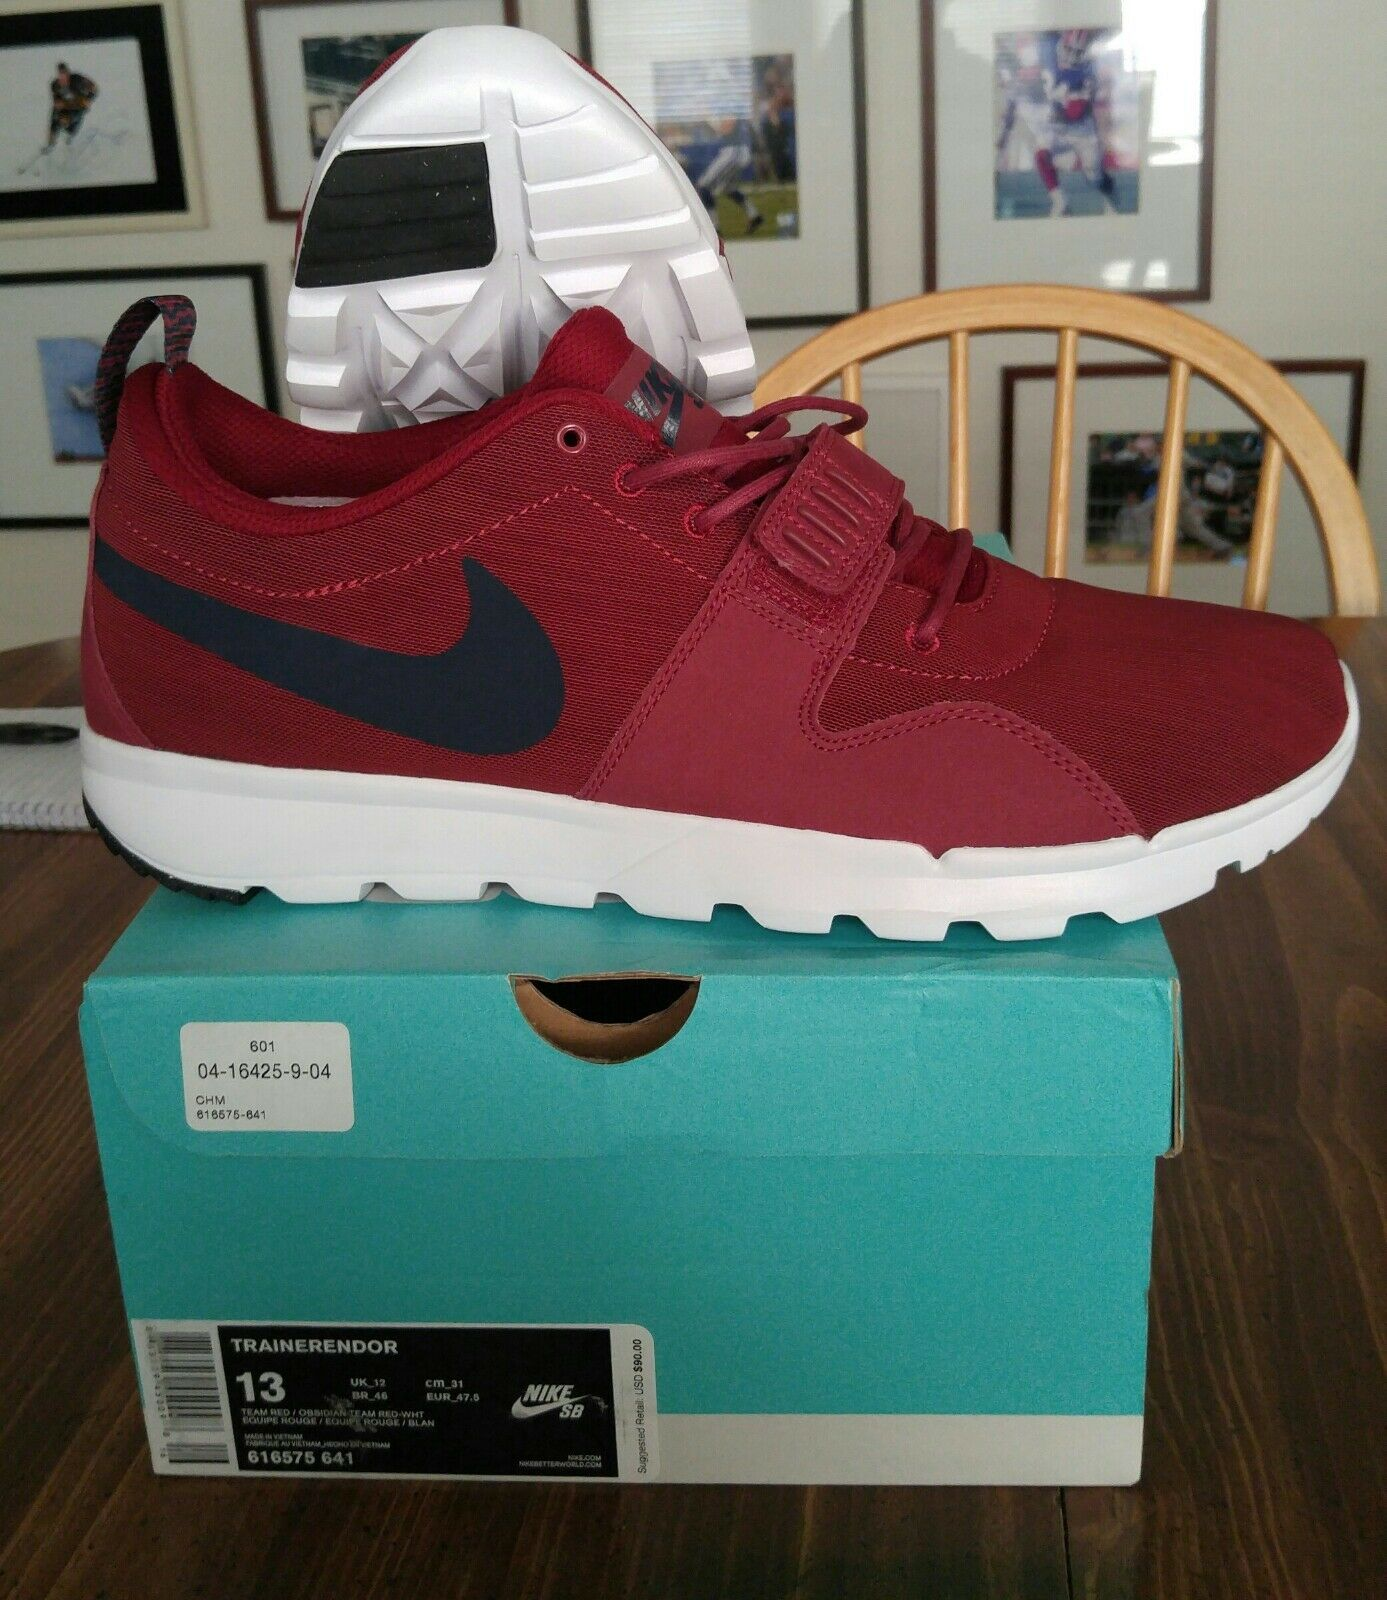 Nike Men's Trainerendor SB 616575641 Size 13 Brand New